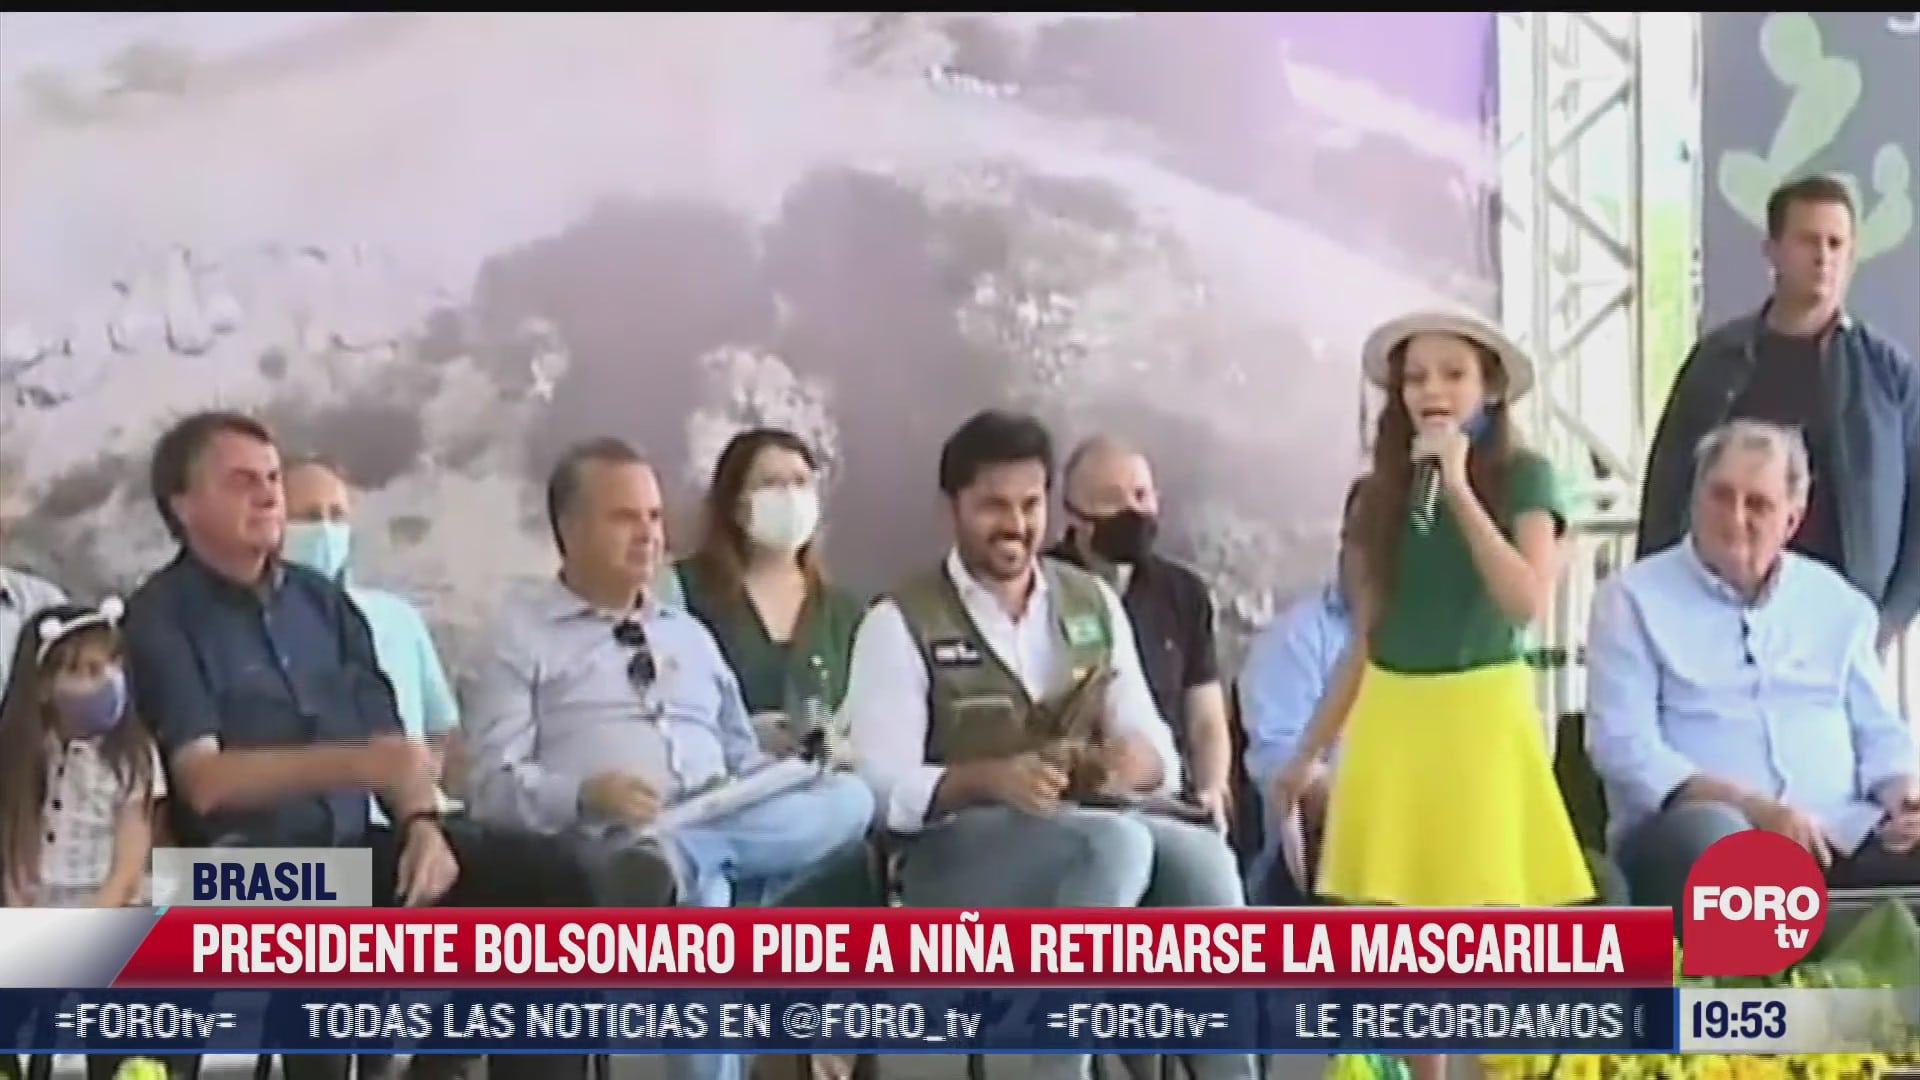 bolsonaro pide a nina quitarse cubrebocas